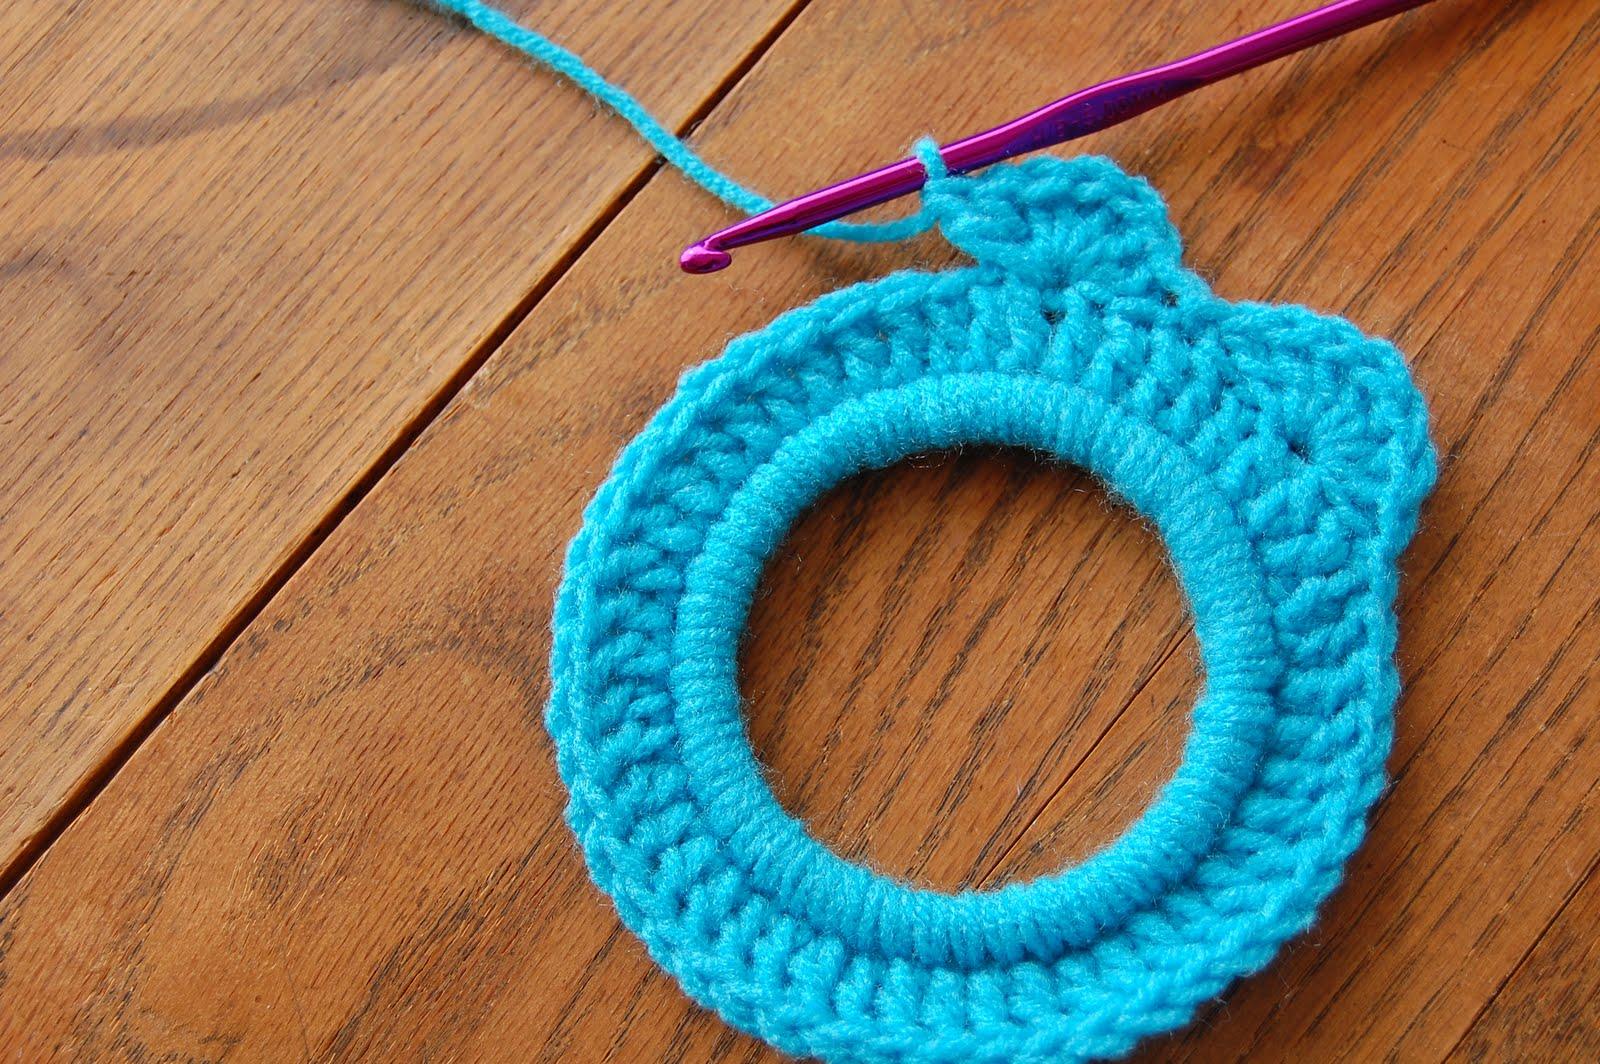 Crochet Stitch Rings Of Love : ... Nova - Whatever Lola Wants: Mary Go Round crochet flower ring tutorial